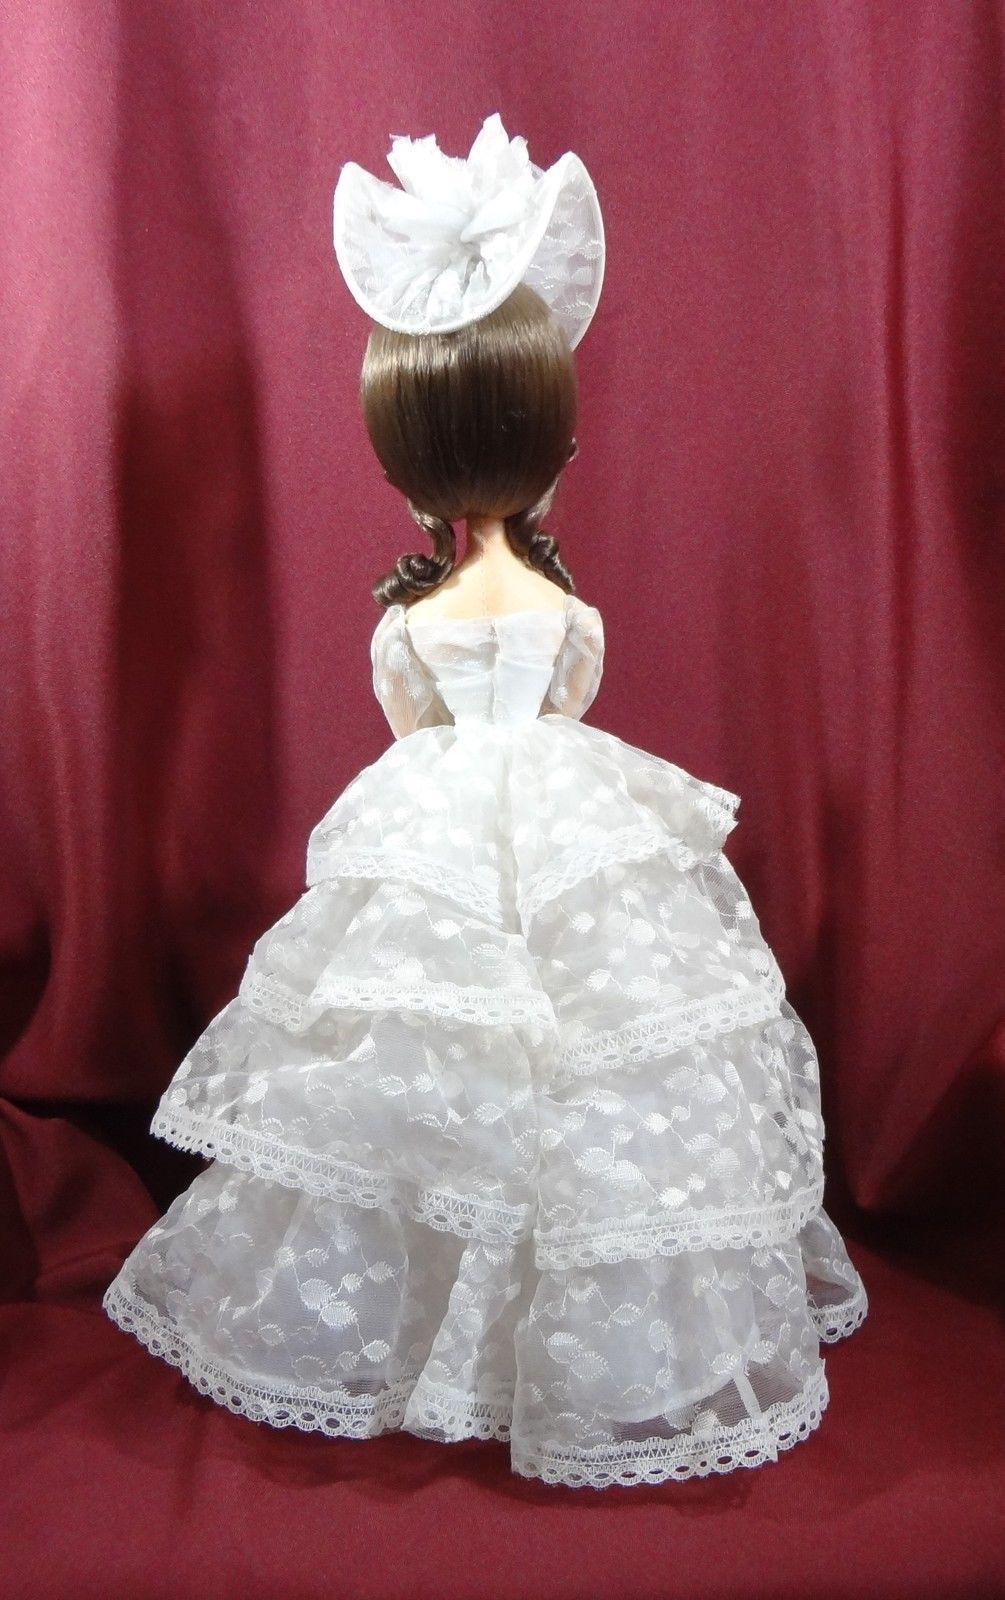 Big Eyed Southern Belle Bradley Style Vintage Doll